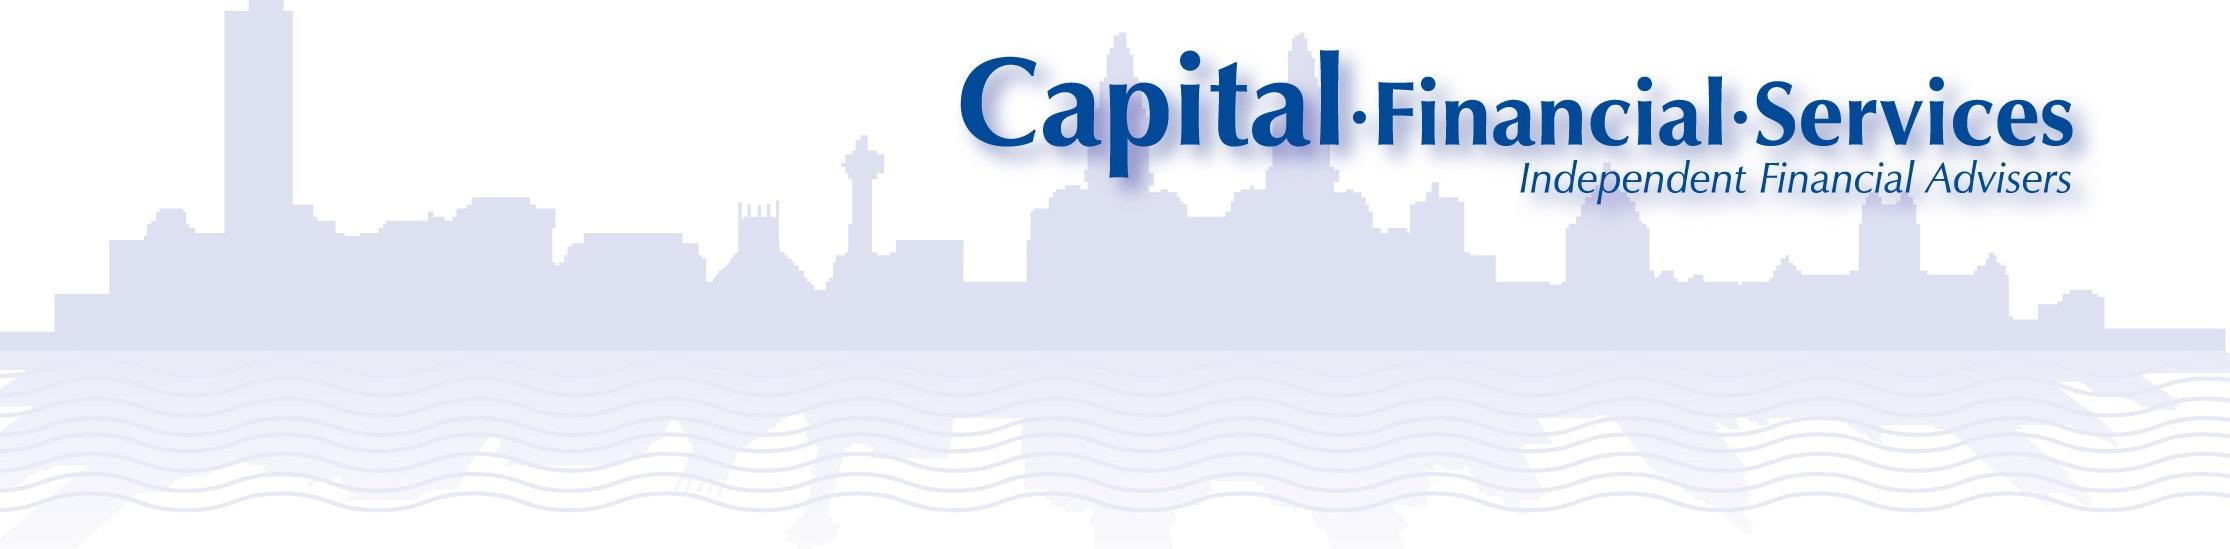 Capital Financial Services Logo